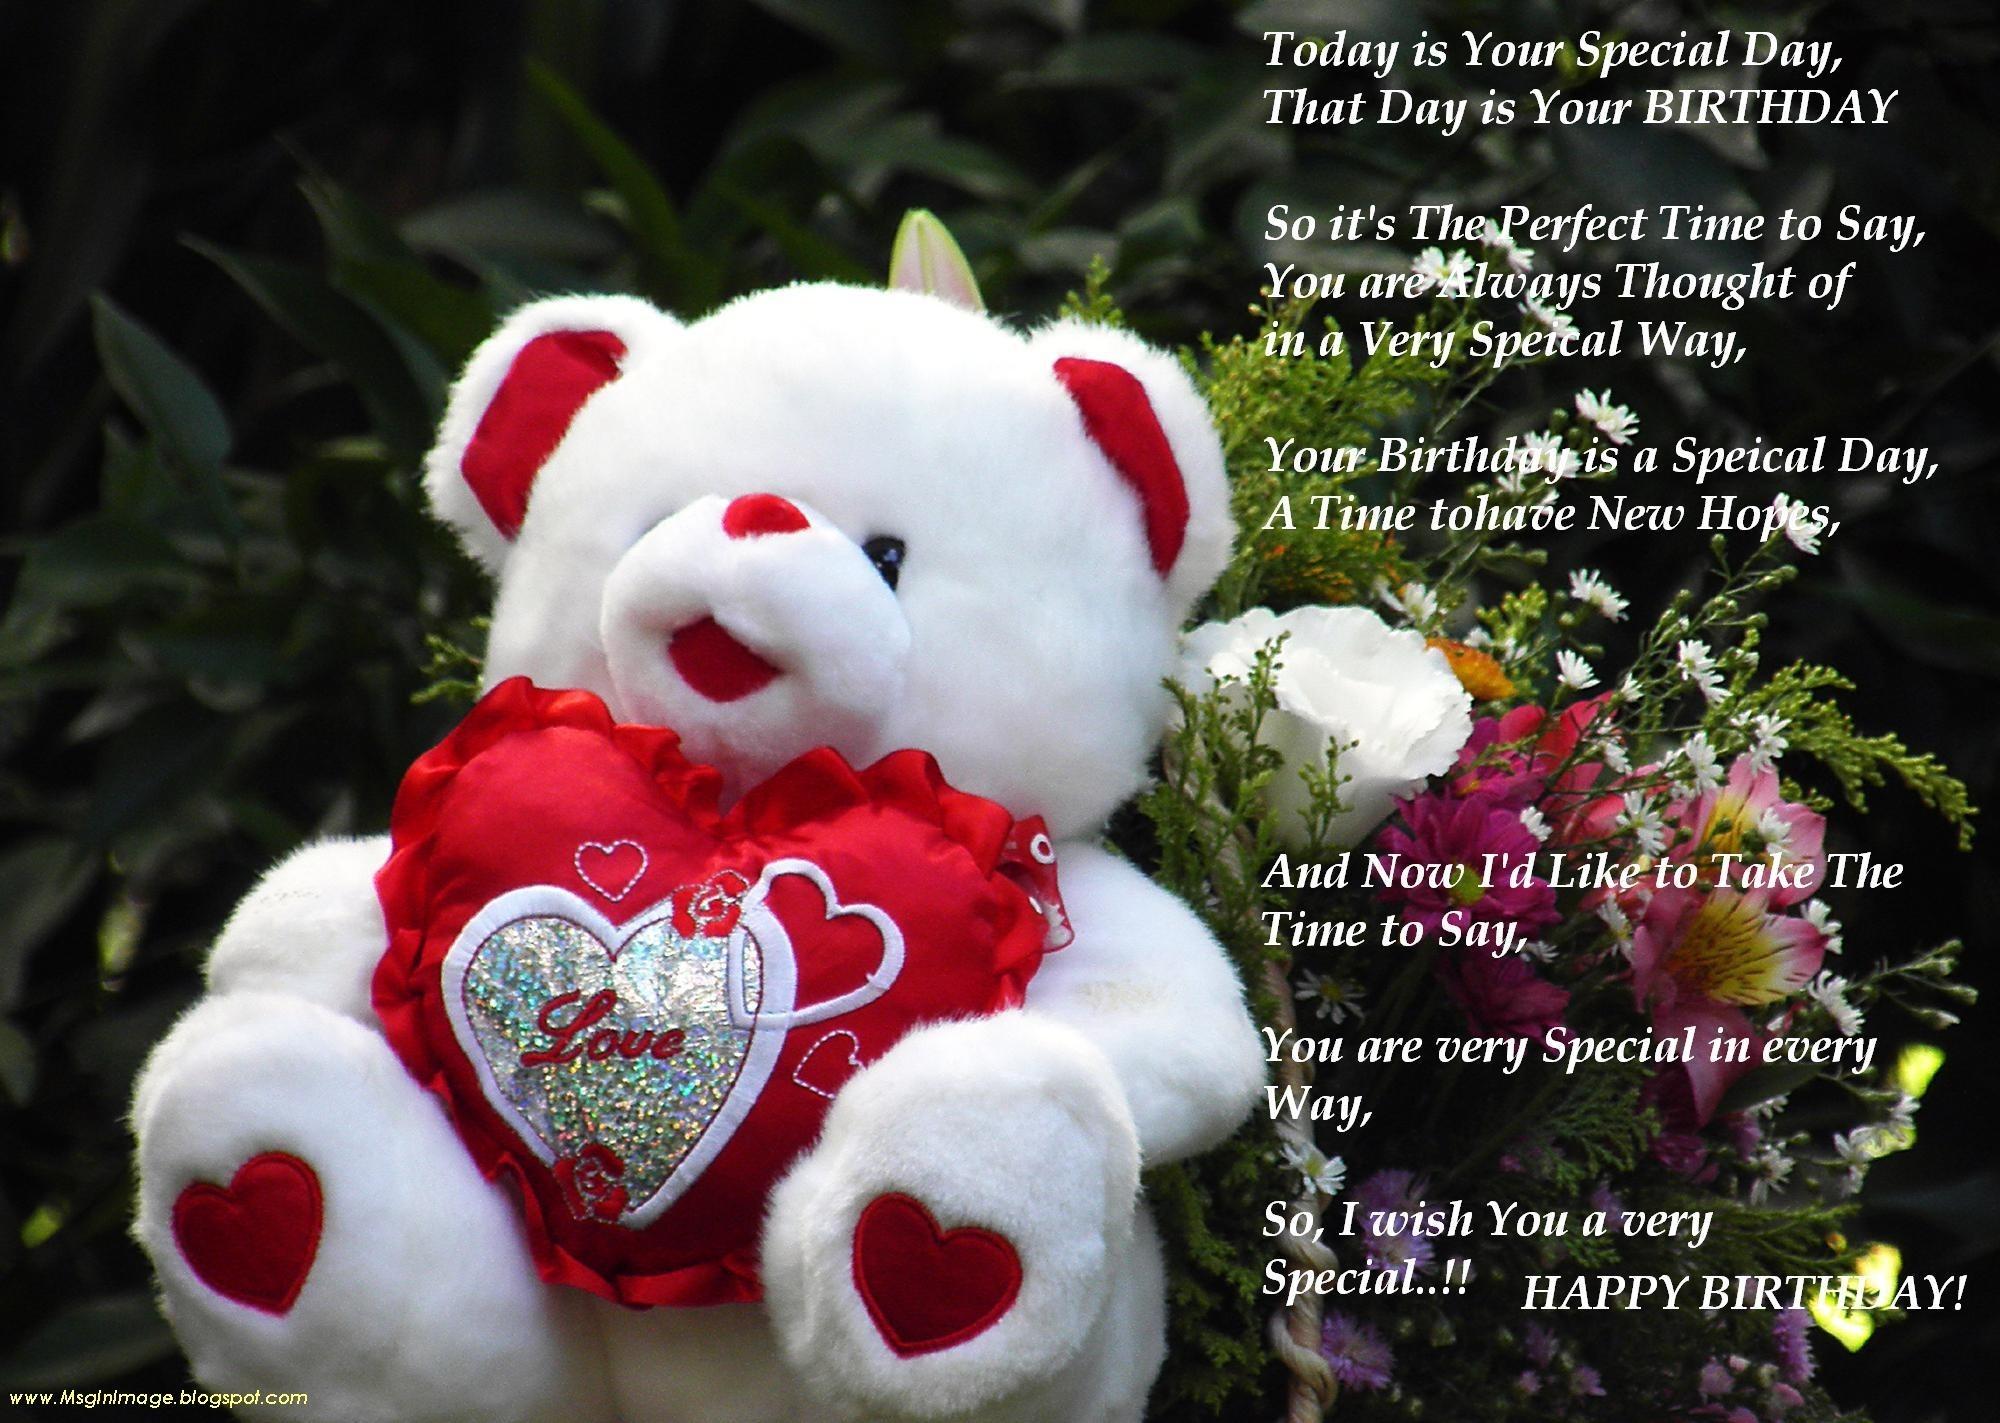 Glamorous Romantic Birthday Wishes - Romantic Good Morning Teddy Bear - HD Wallpaper